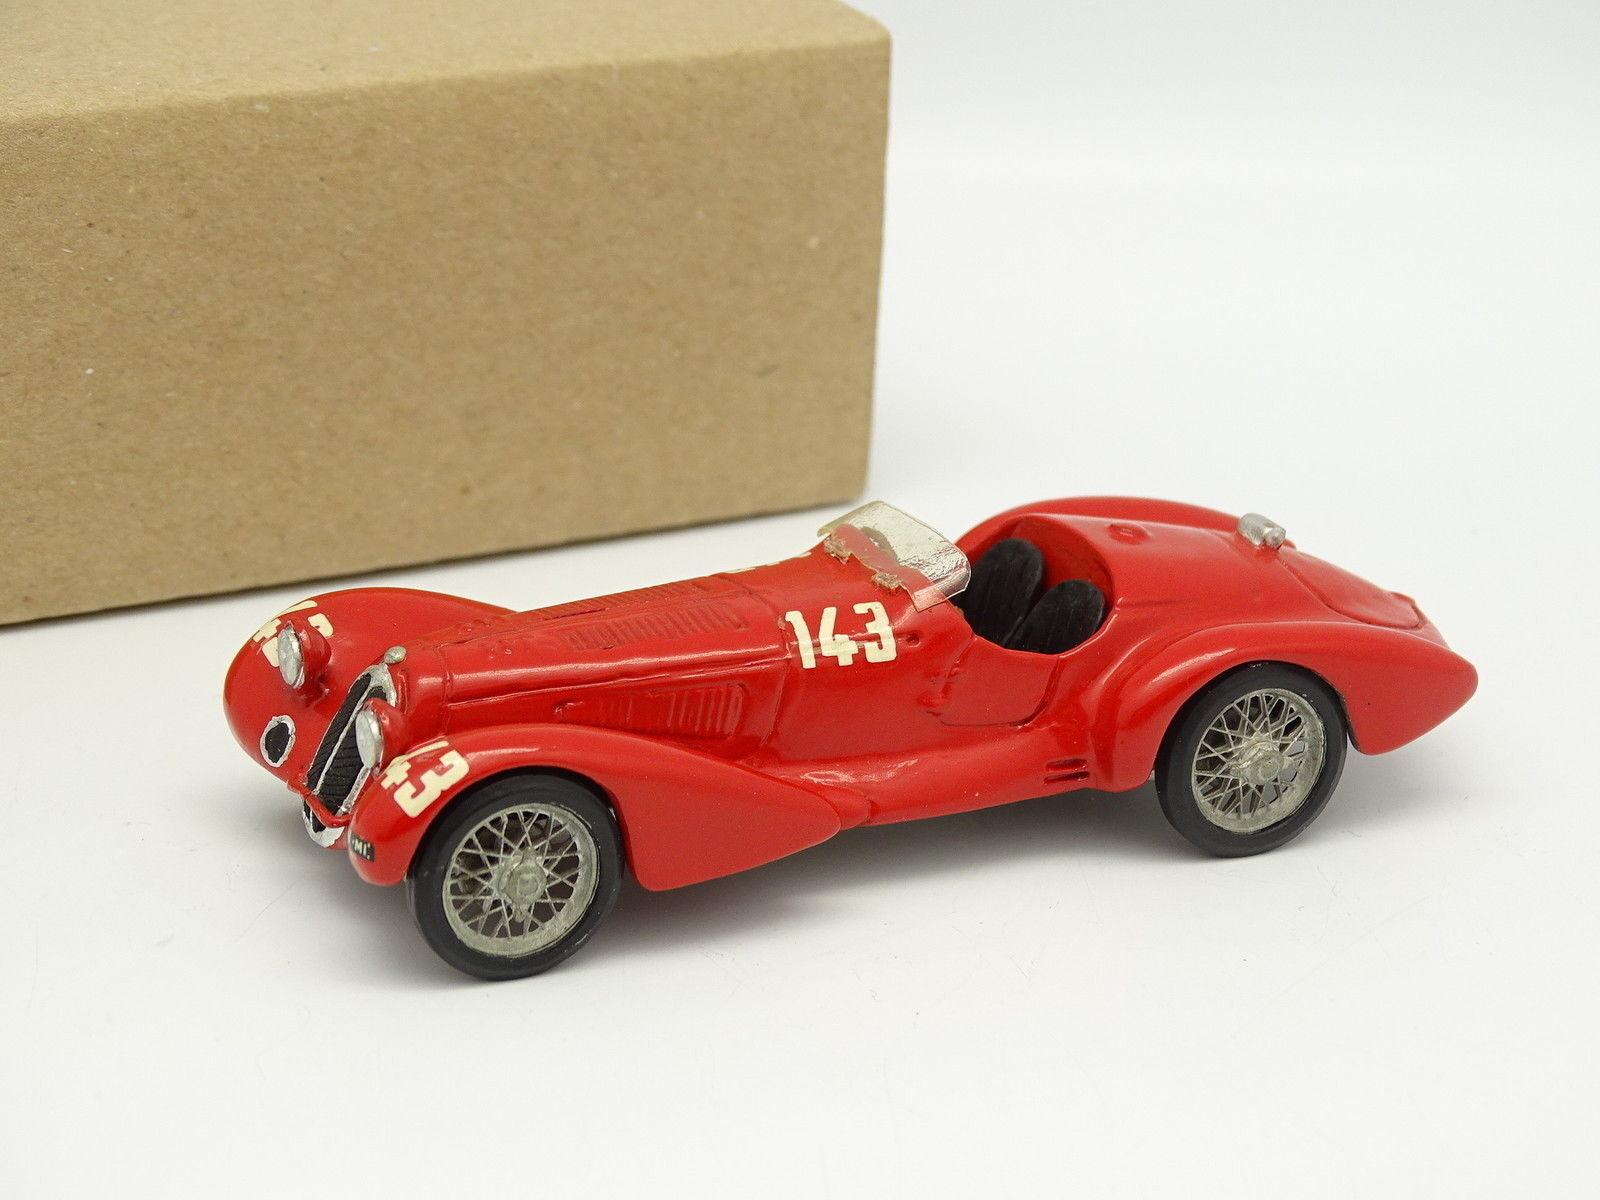 IDEA3  Kit monté Métal 1 43 - Alfa Romeo 8C 2900B Mille Miglia 1938 N°143